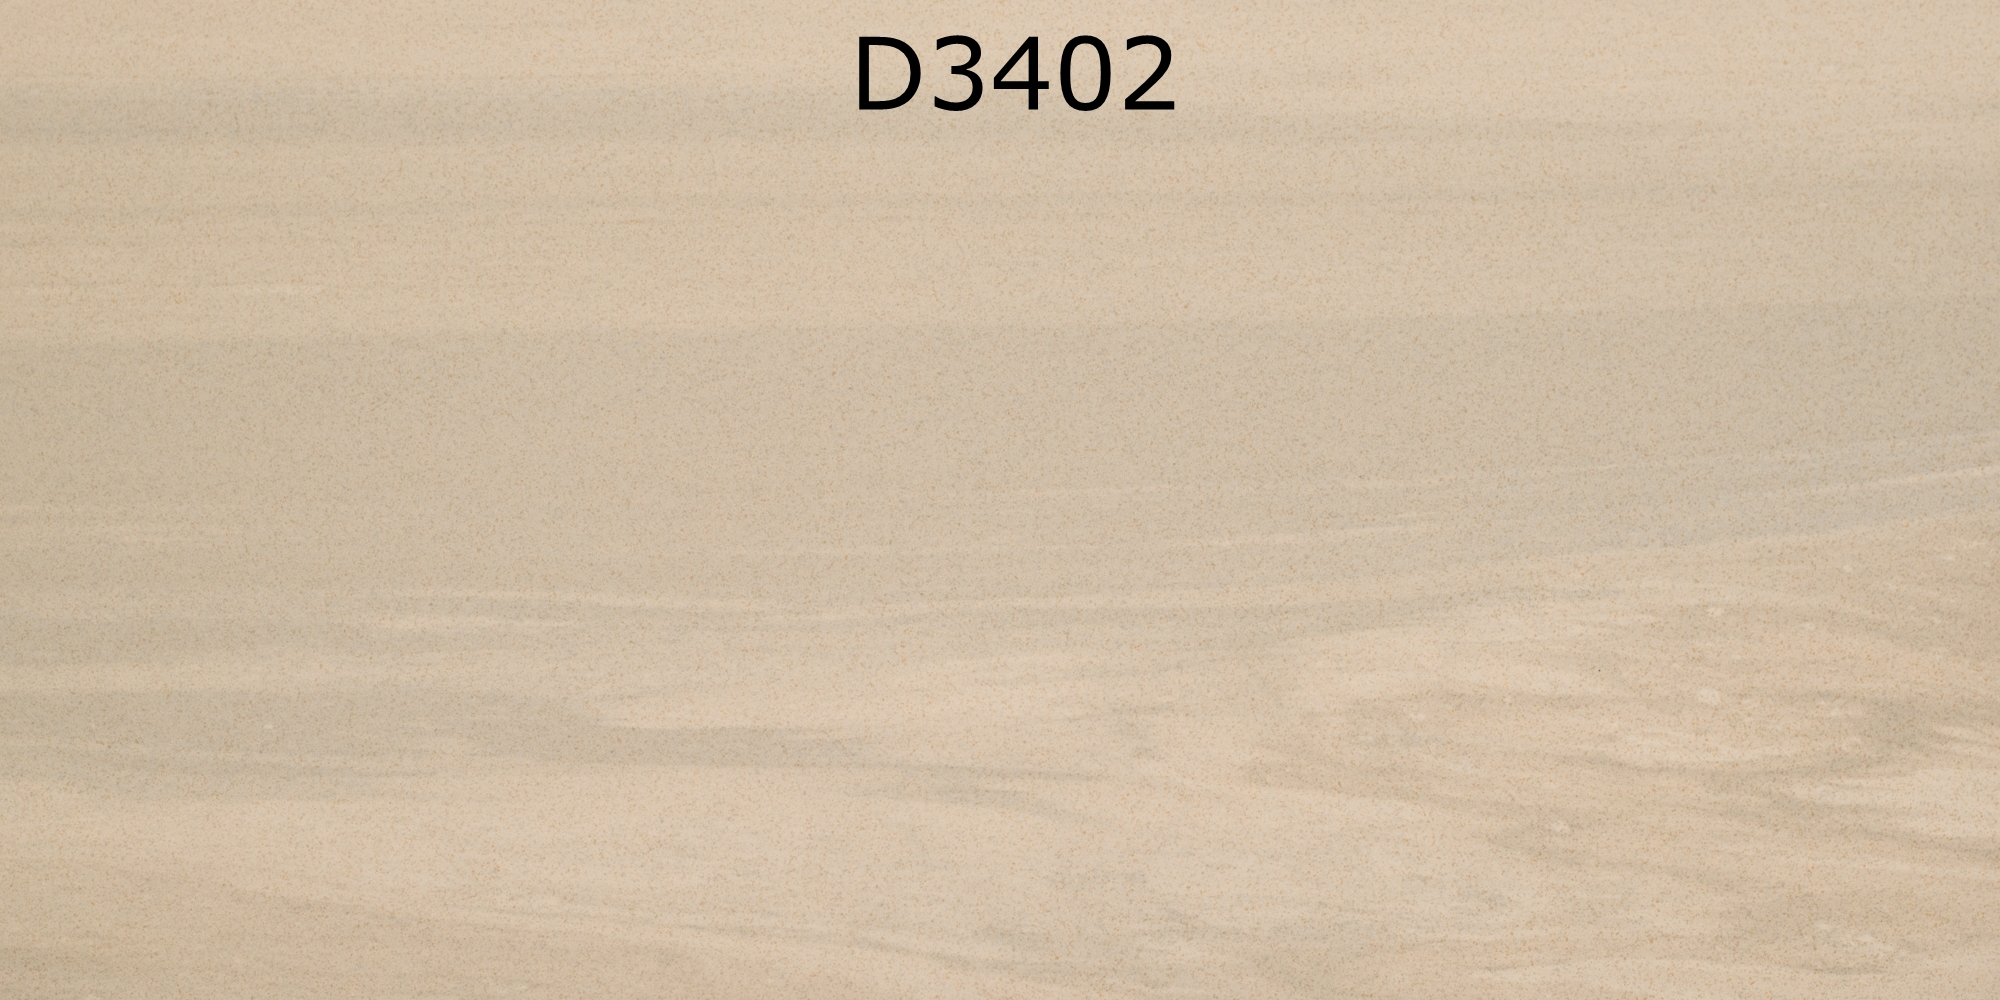 D3402